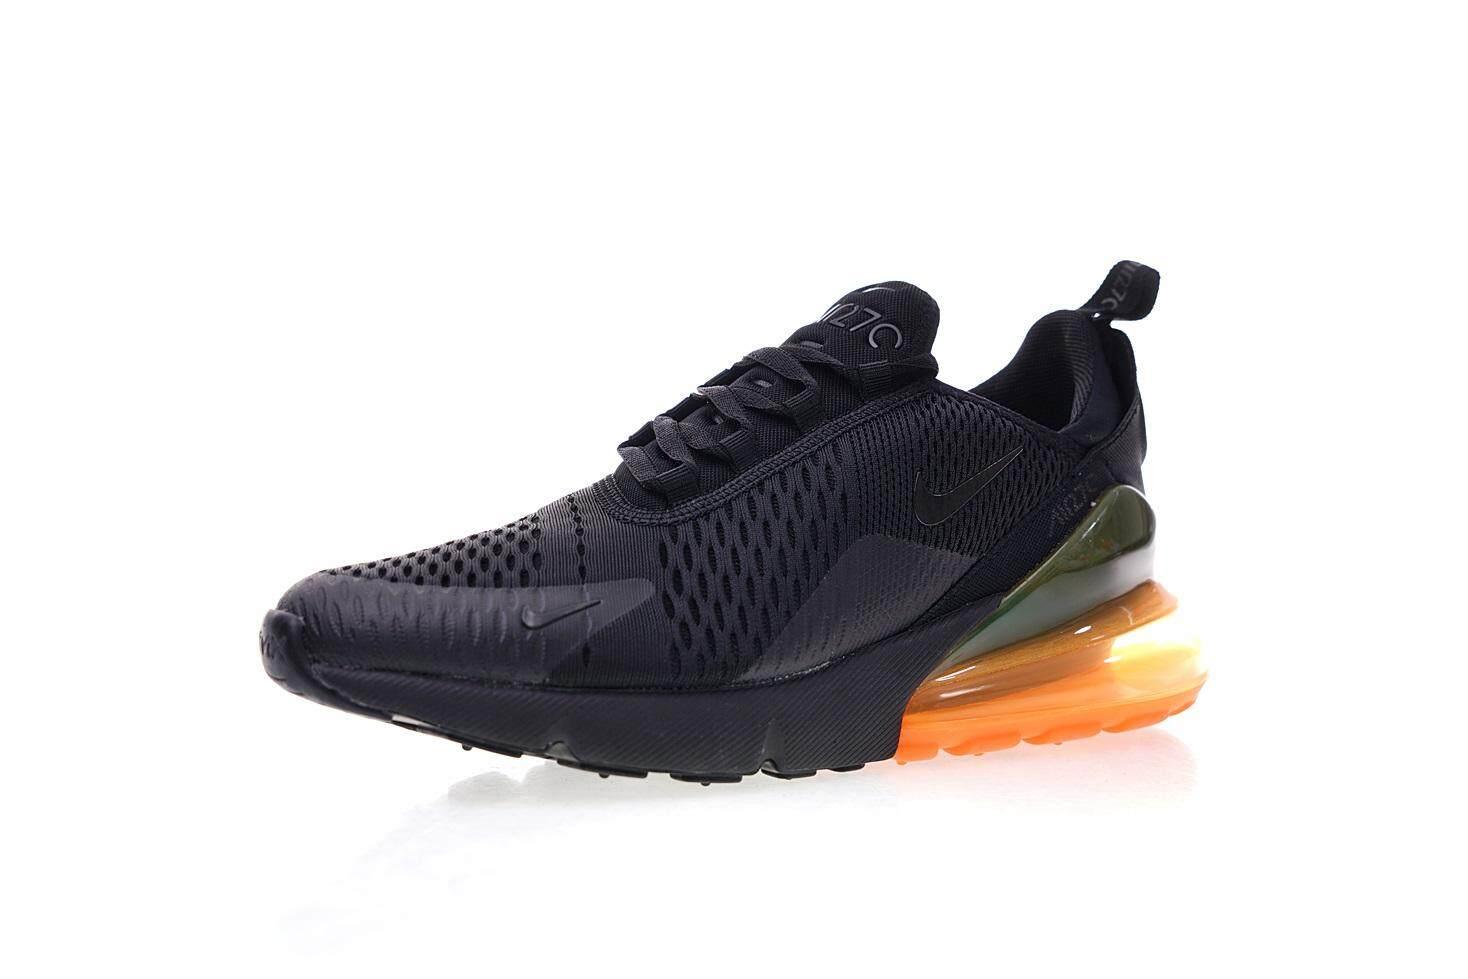 Nike Air Max 270 Men s Comfortable Running Sneakers Training Sport Shoes ( Black Orange) 3359d2ae7